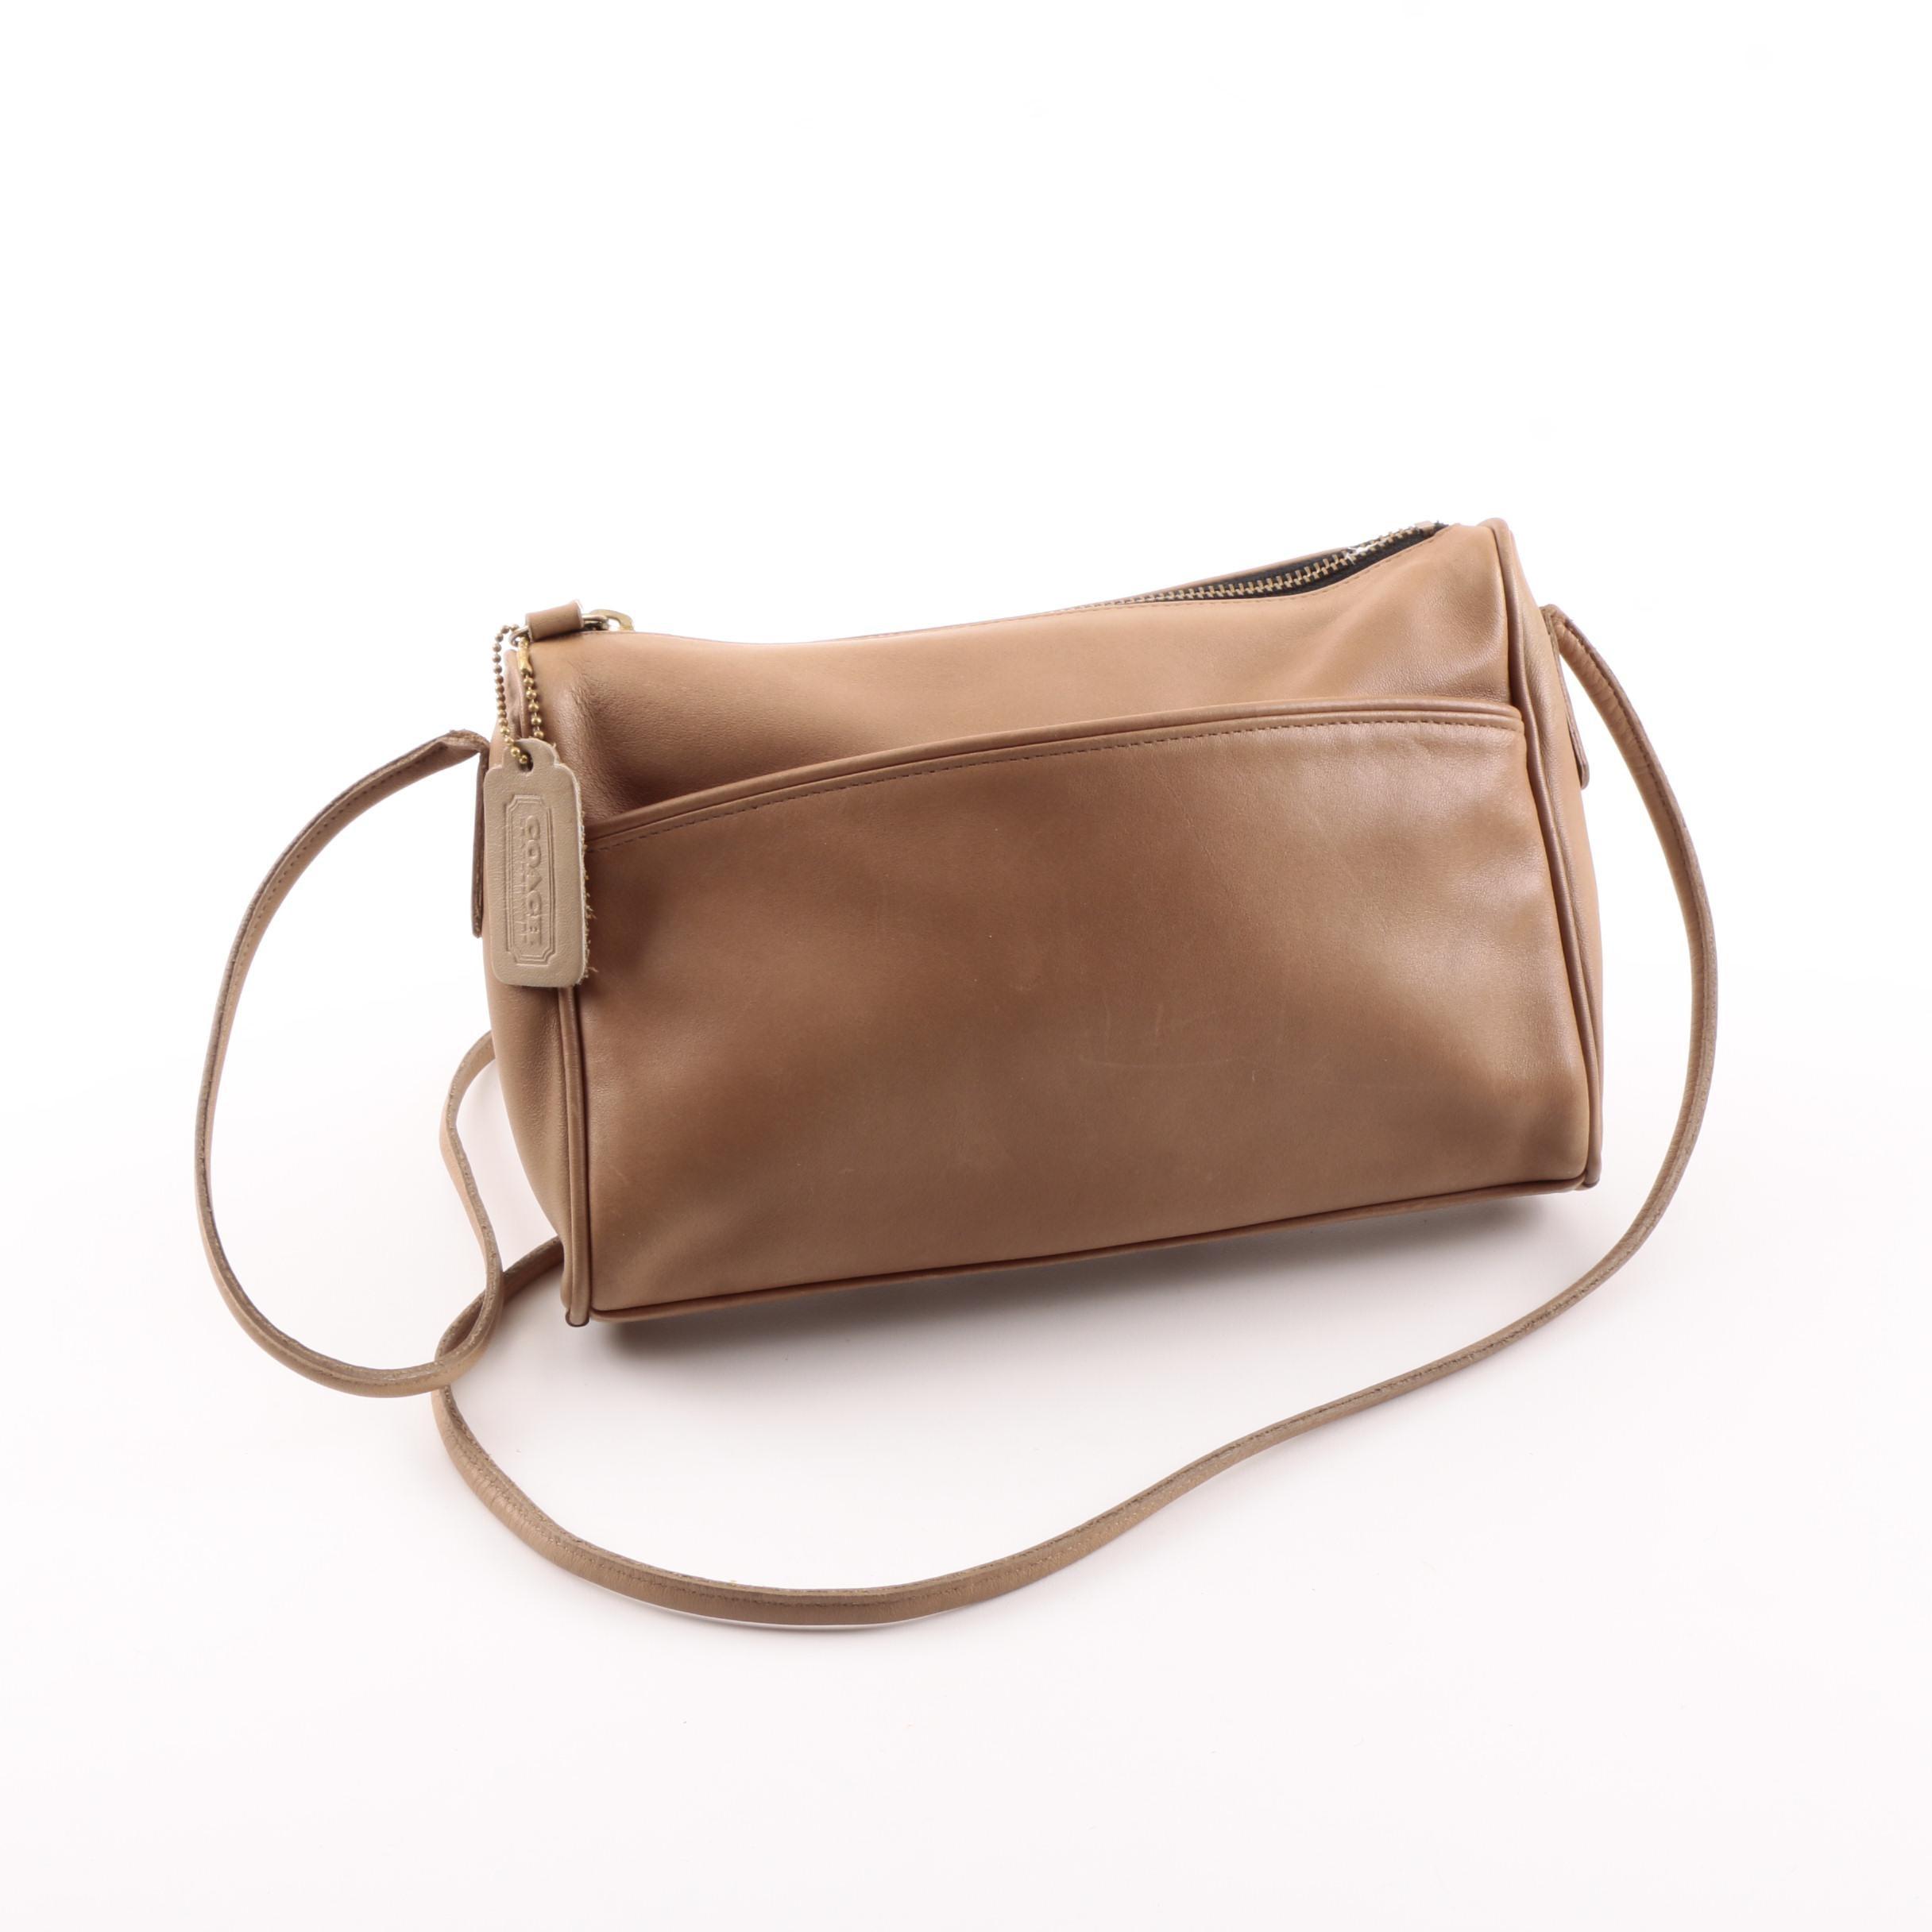 Coach Brown Leather Crossbody Bag